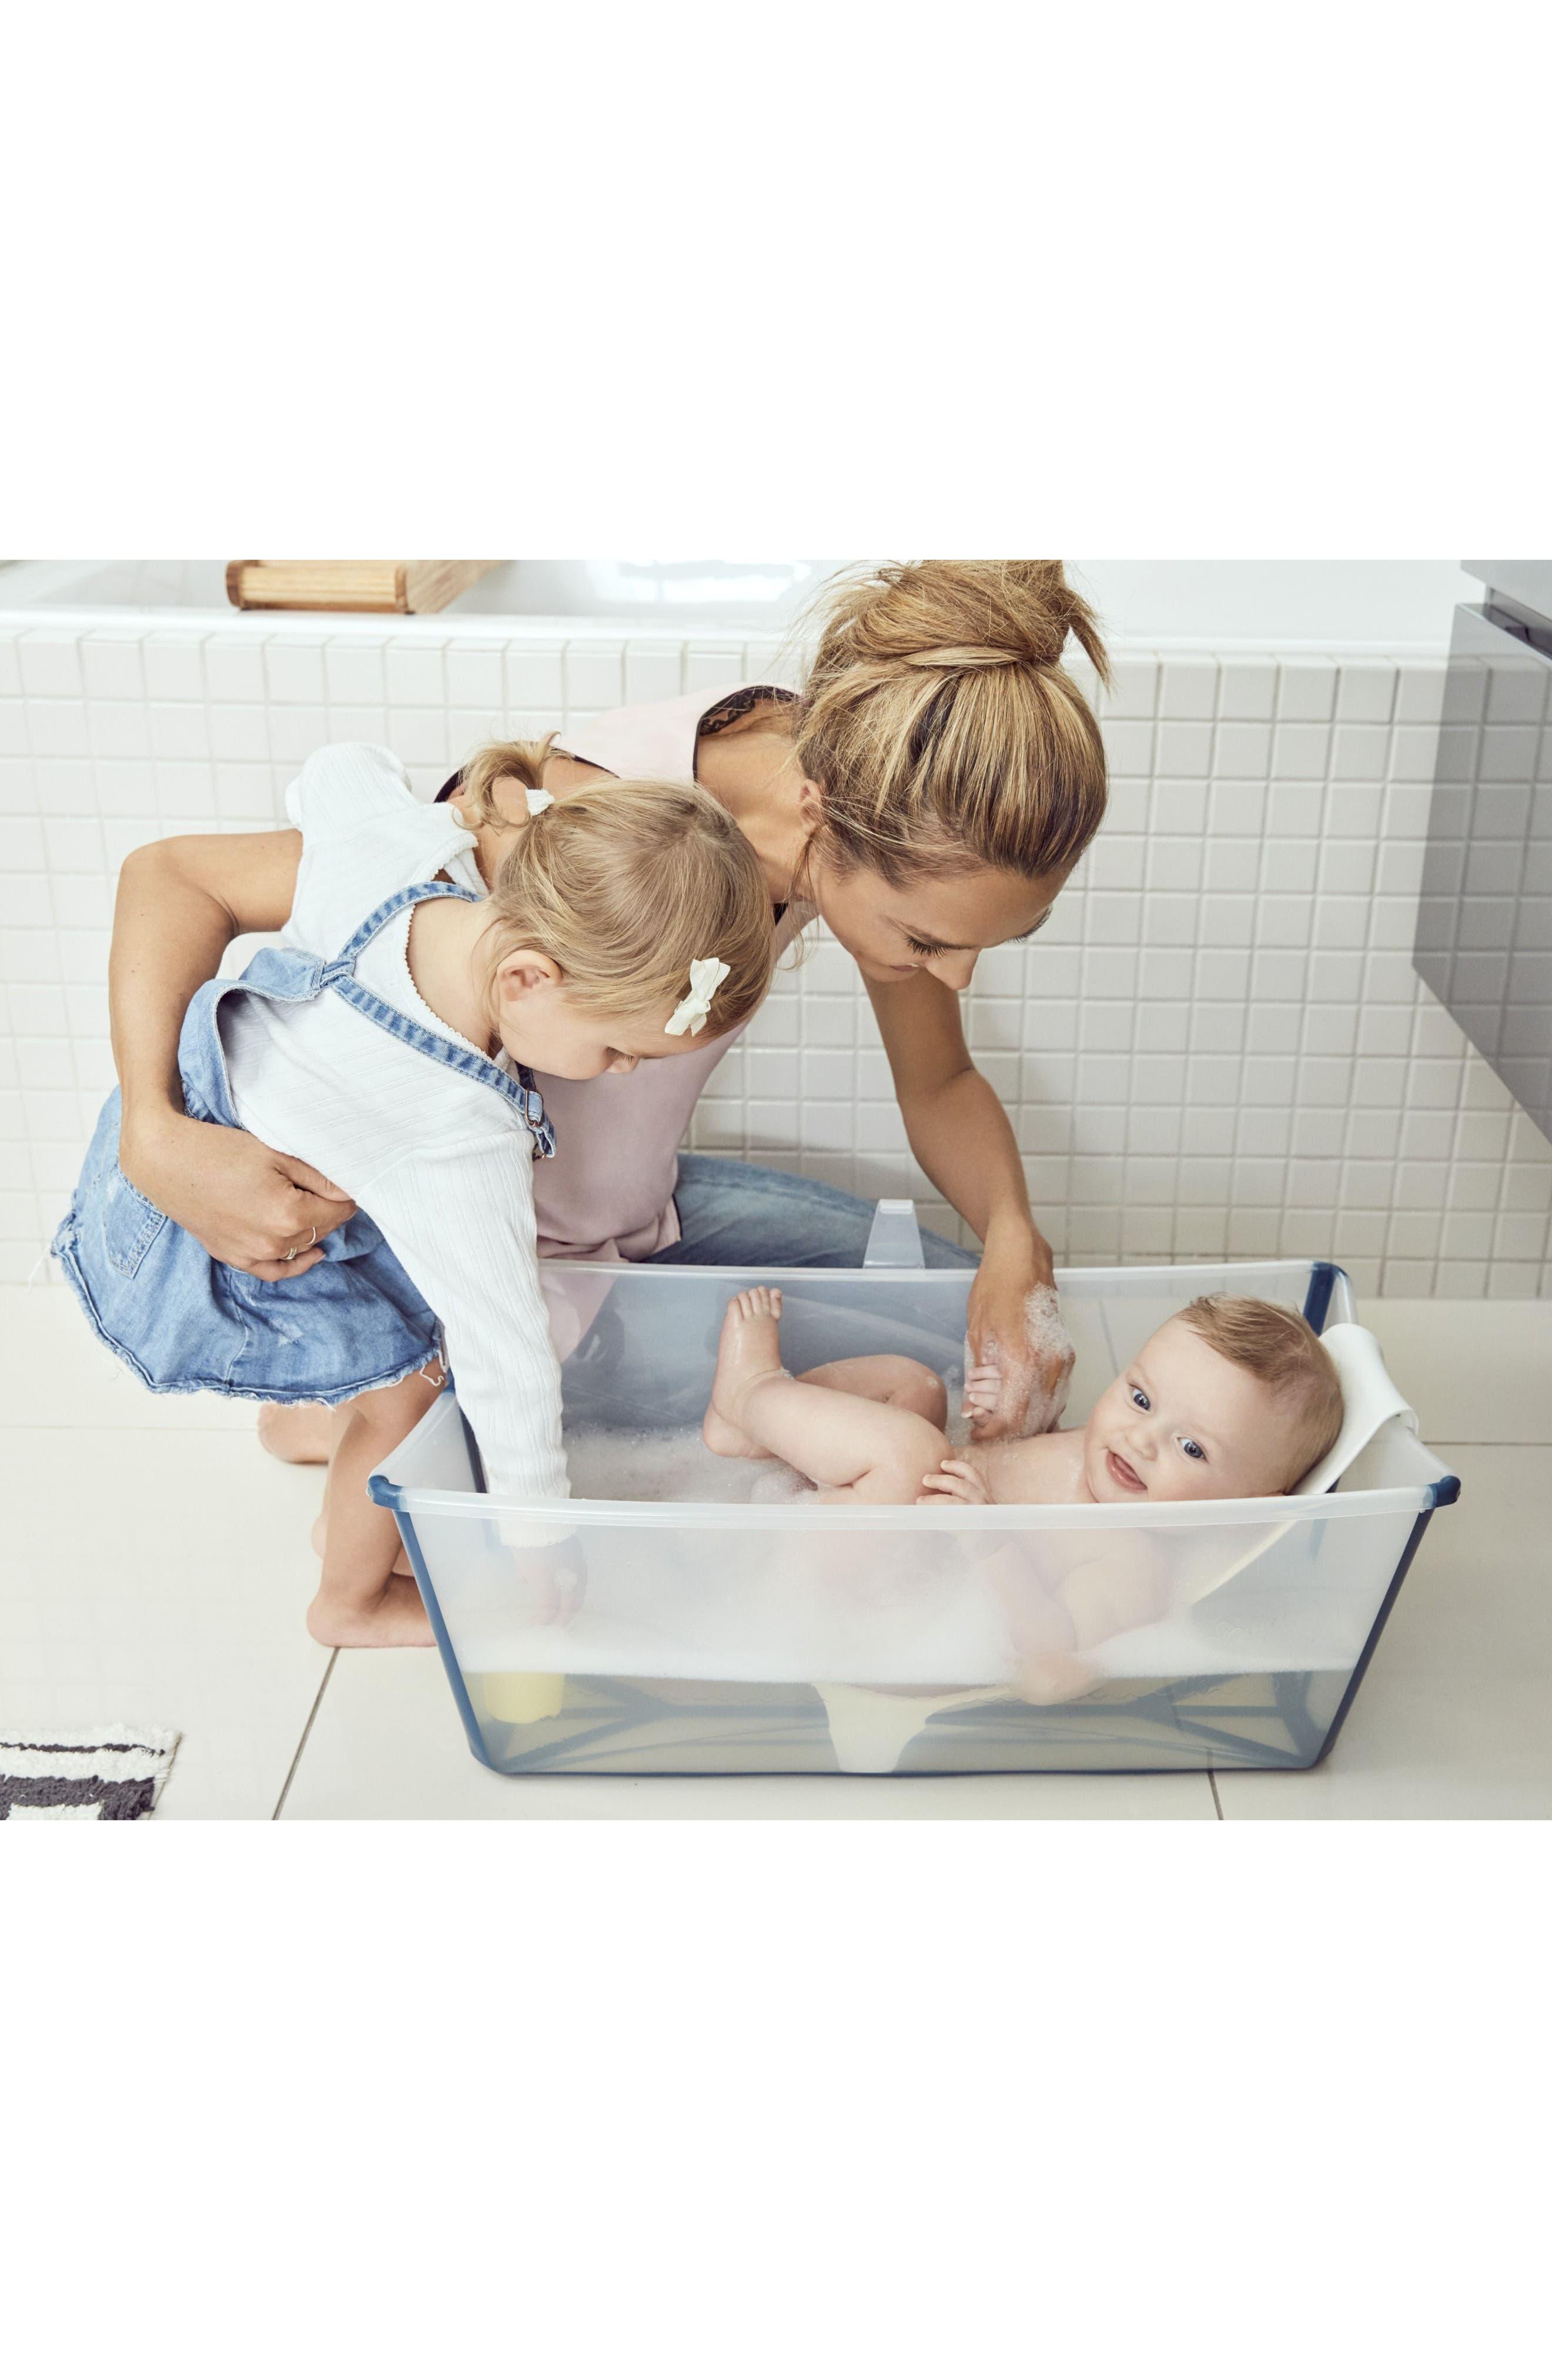 Flexi Bath<sup>®</sup> Foldable Baby Bath Tub with Newborn Support,                             Alternate thumbnail 2, color,                             Transparent Blue